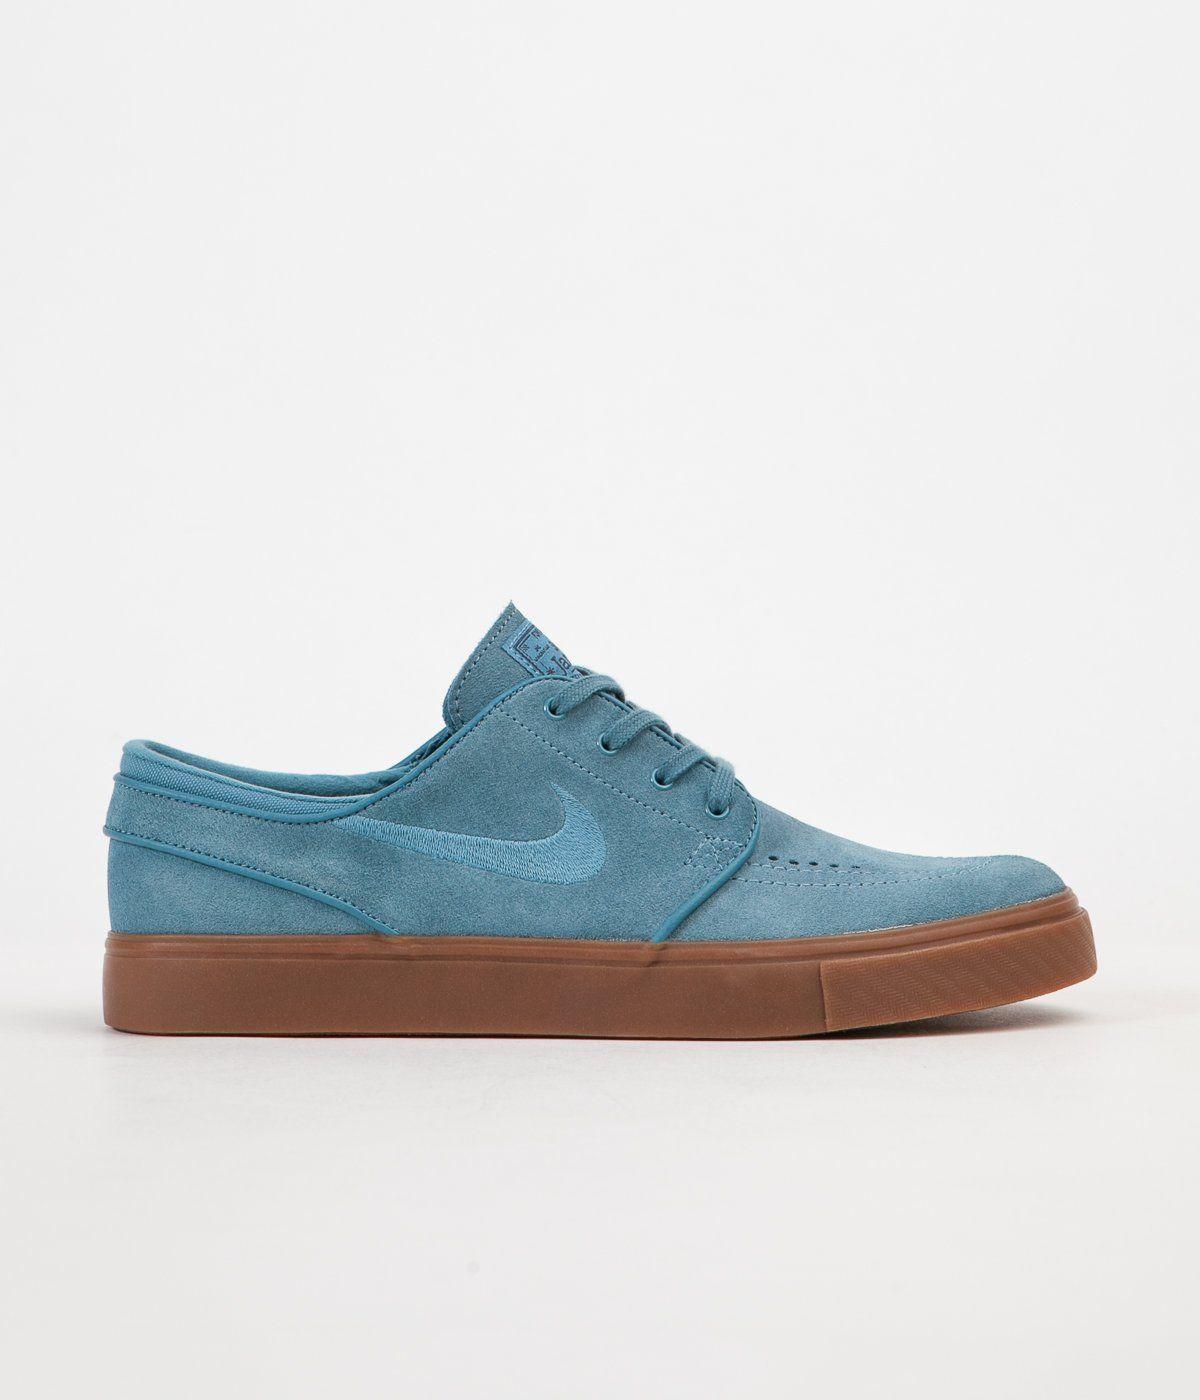 6e5cdbb441c4 Nike SB Stefan Janoski Shoes - Noise Aqua   Noise Aqua - Thunder Blue